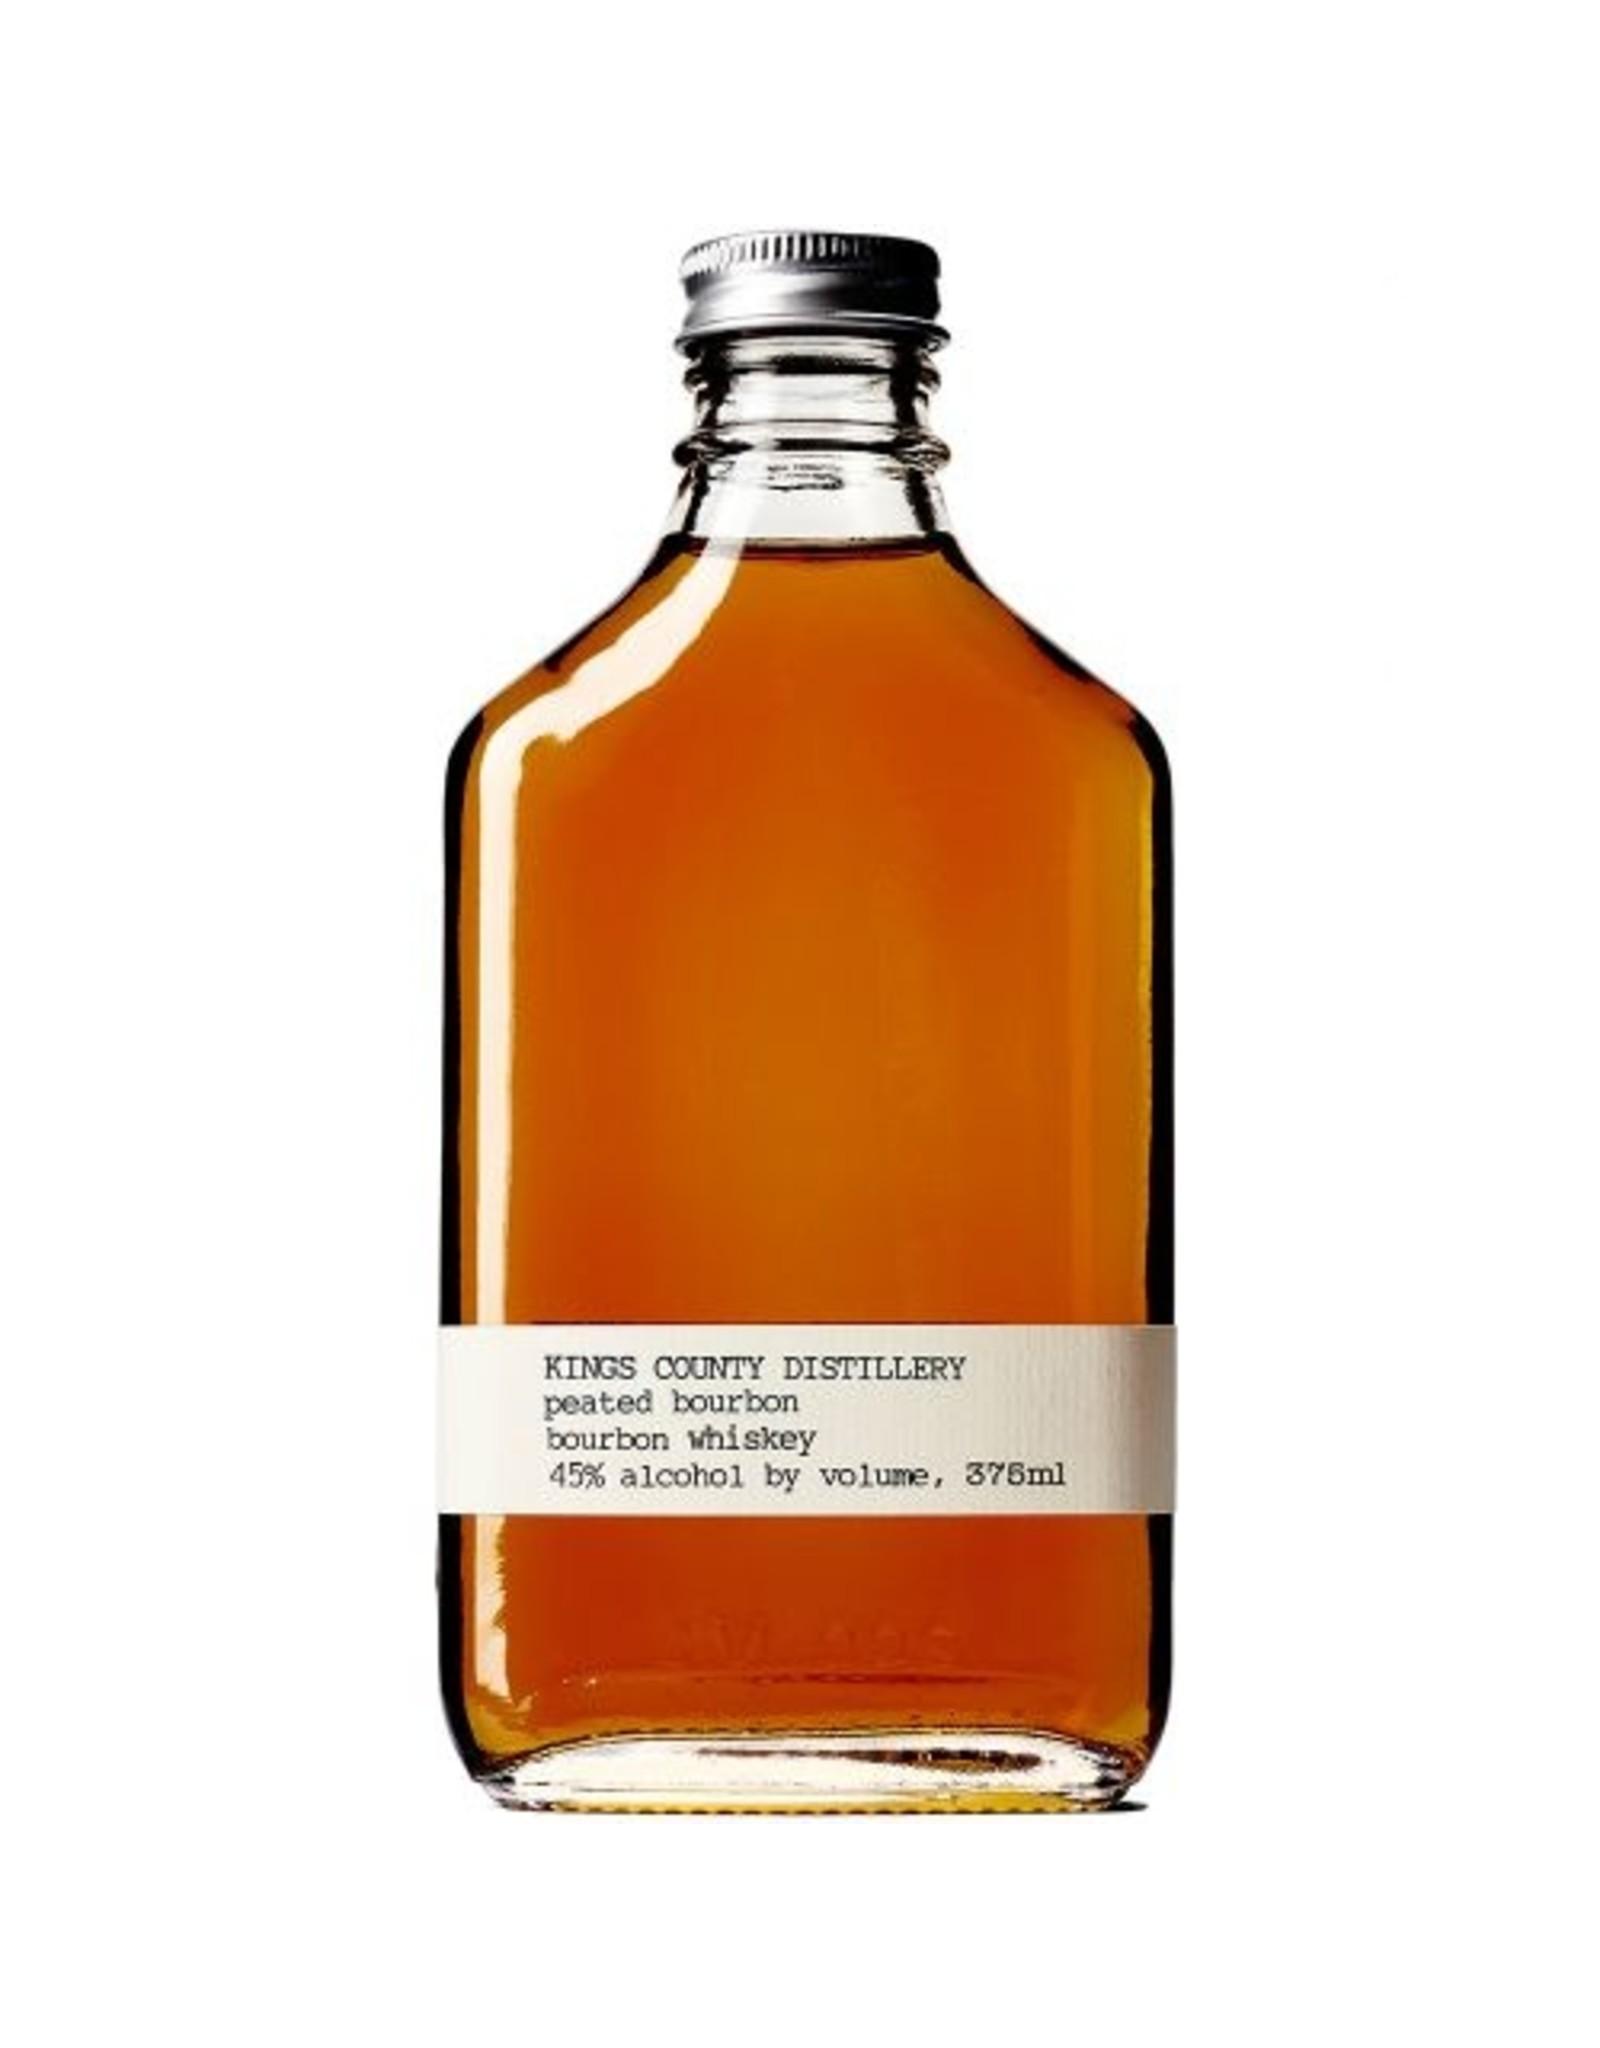 Kings County Distillery Peated Bourbon